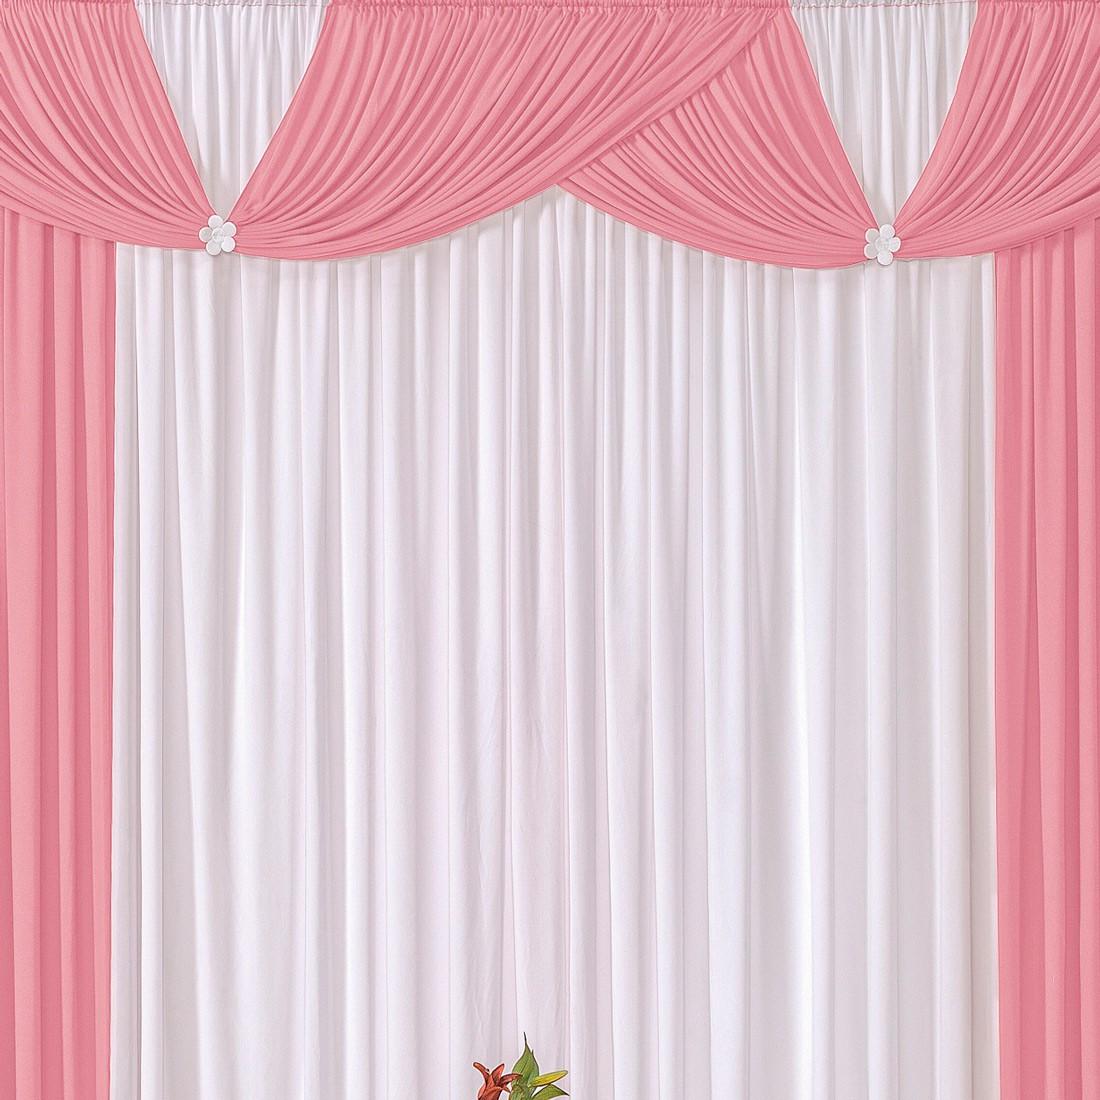 Cortina Londrina Rosa/Branco 3,00m X 2,60m p/ Varão Simples